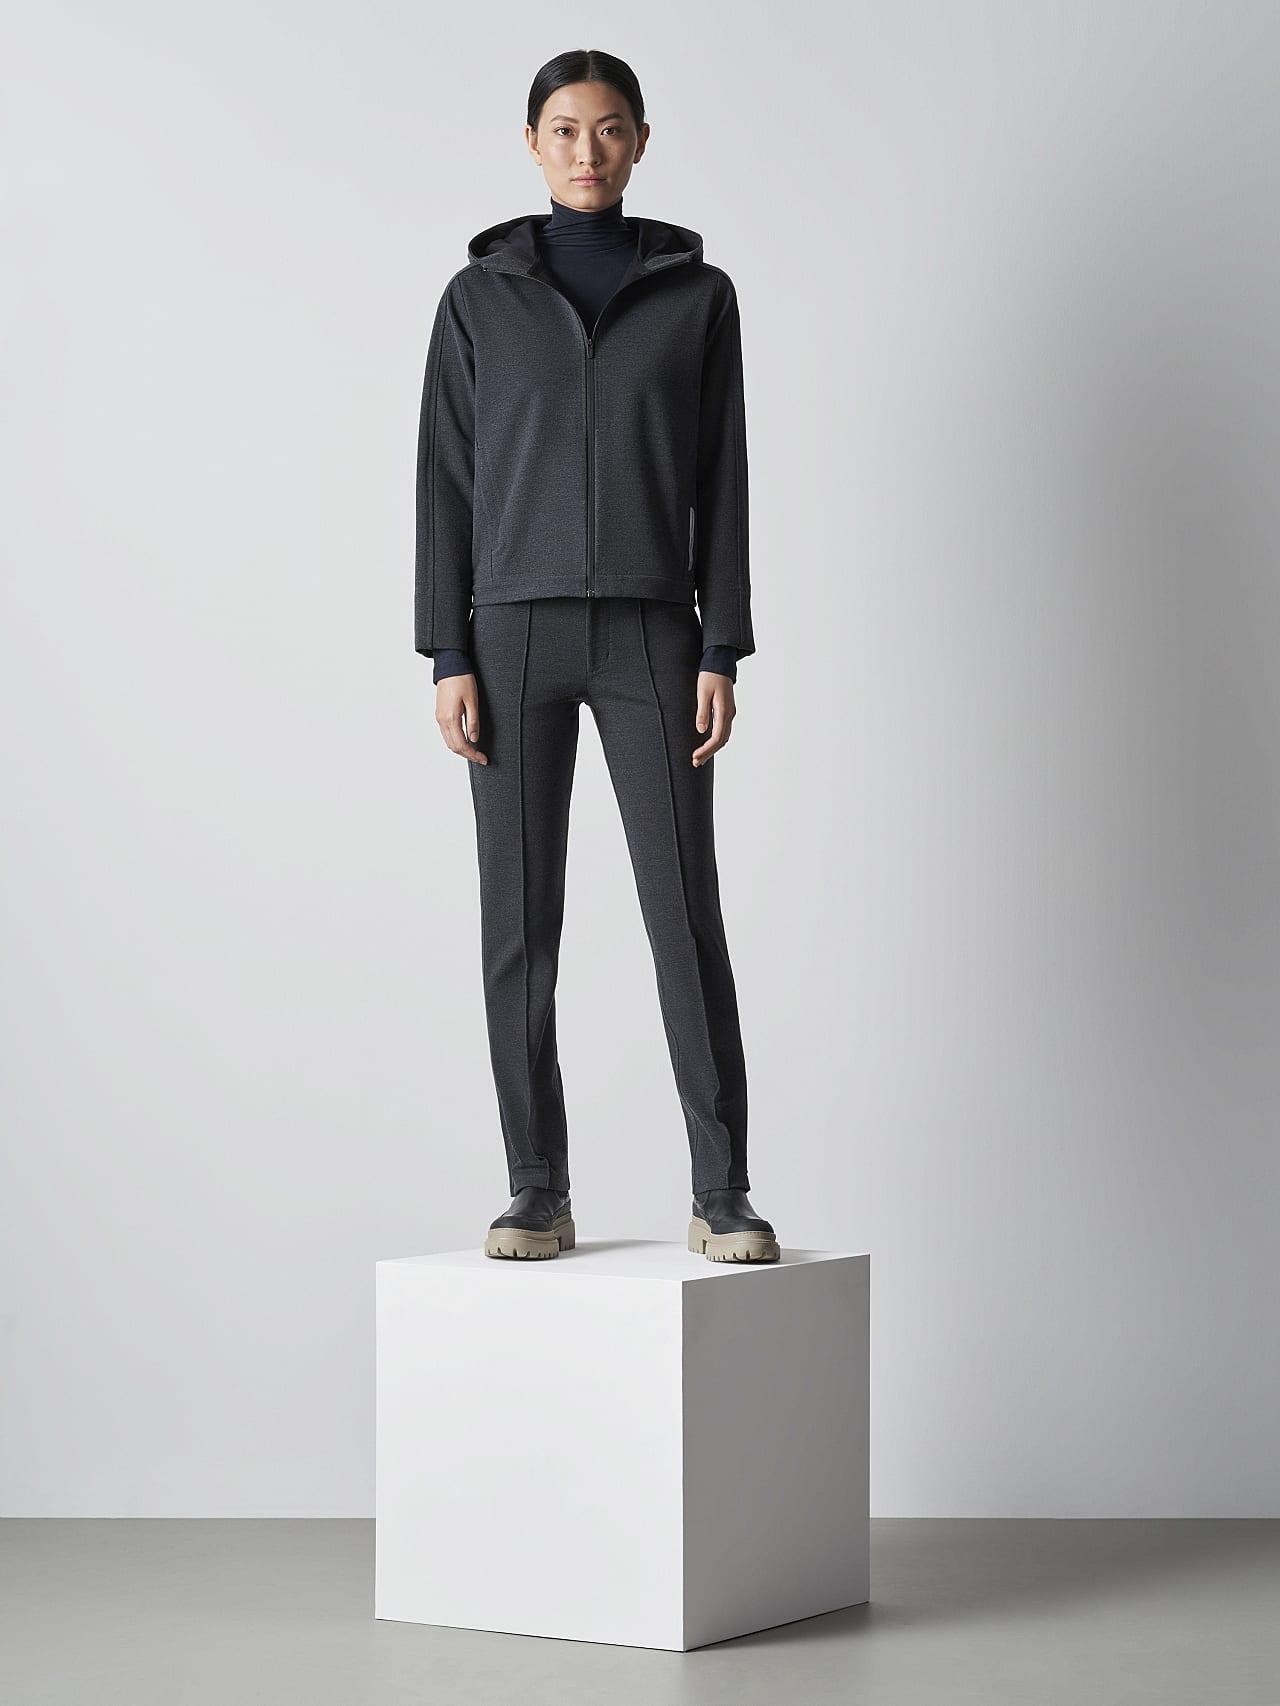 SINNO V2.Y5.02 Waterproof Hooded Jacket dark grey / anthracite Front Alpha Tauri